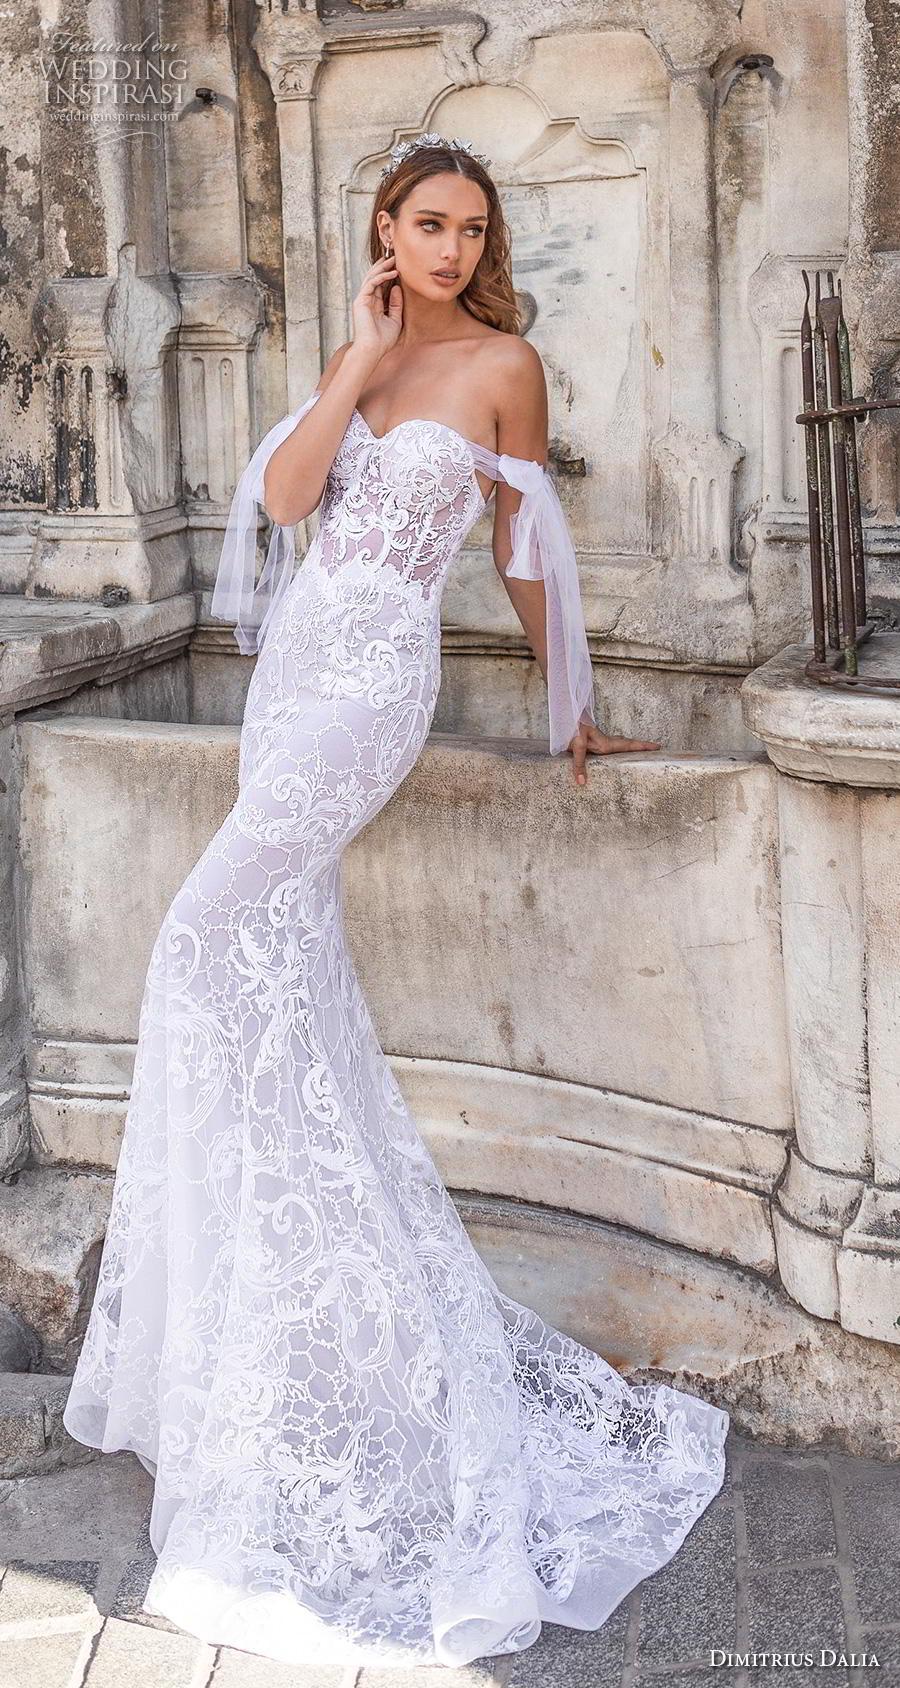 dimitrius dalia 2019 bridal off the shoulder sweetheart neckline full embellishment bustier elegant fit and flare wedding dress  mid back medium train (3) mv